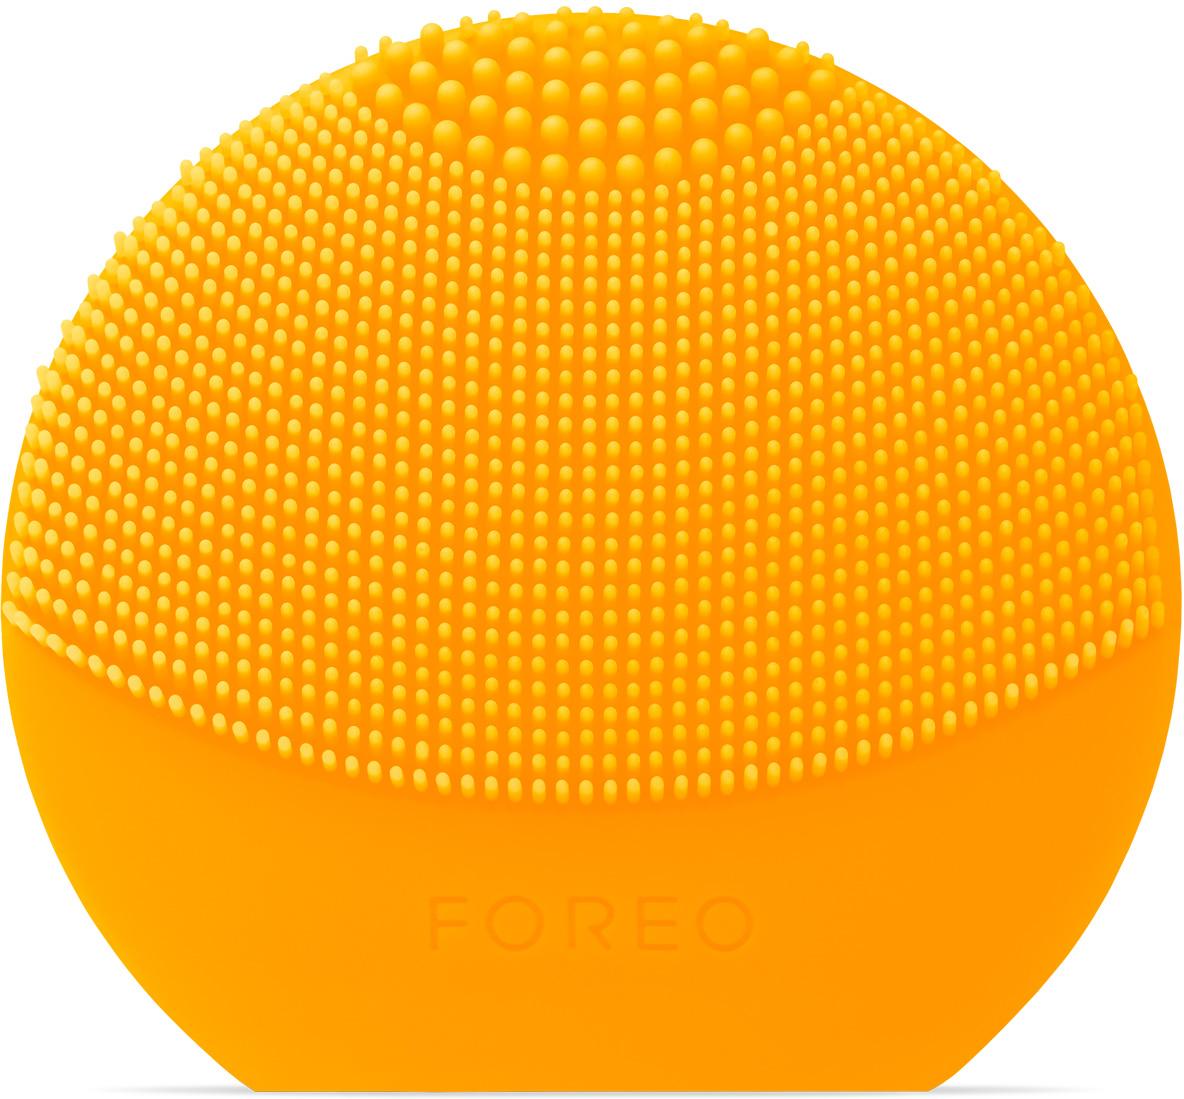 Foreo Щетка для очищения лица LUNA play plus, цвет: Sunflower Yellow (желтый) - Косметологические аппараты